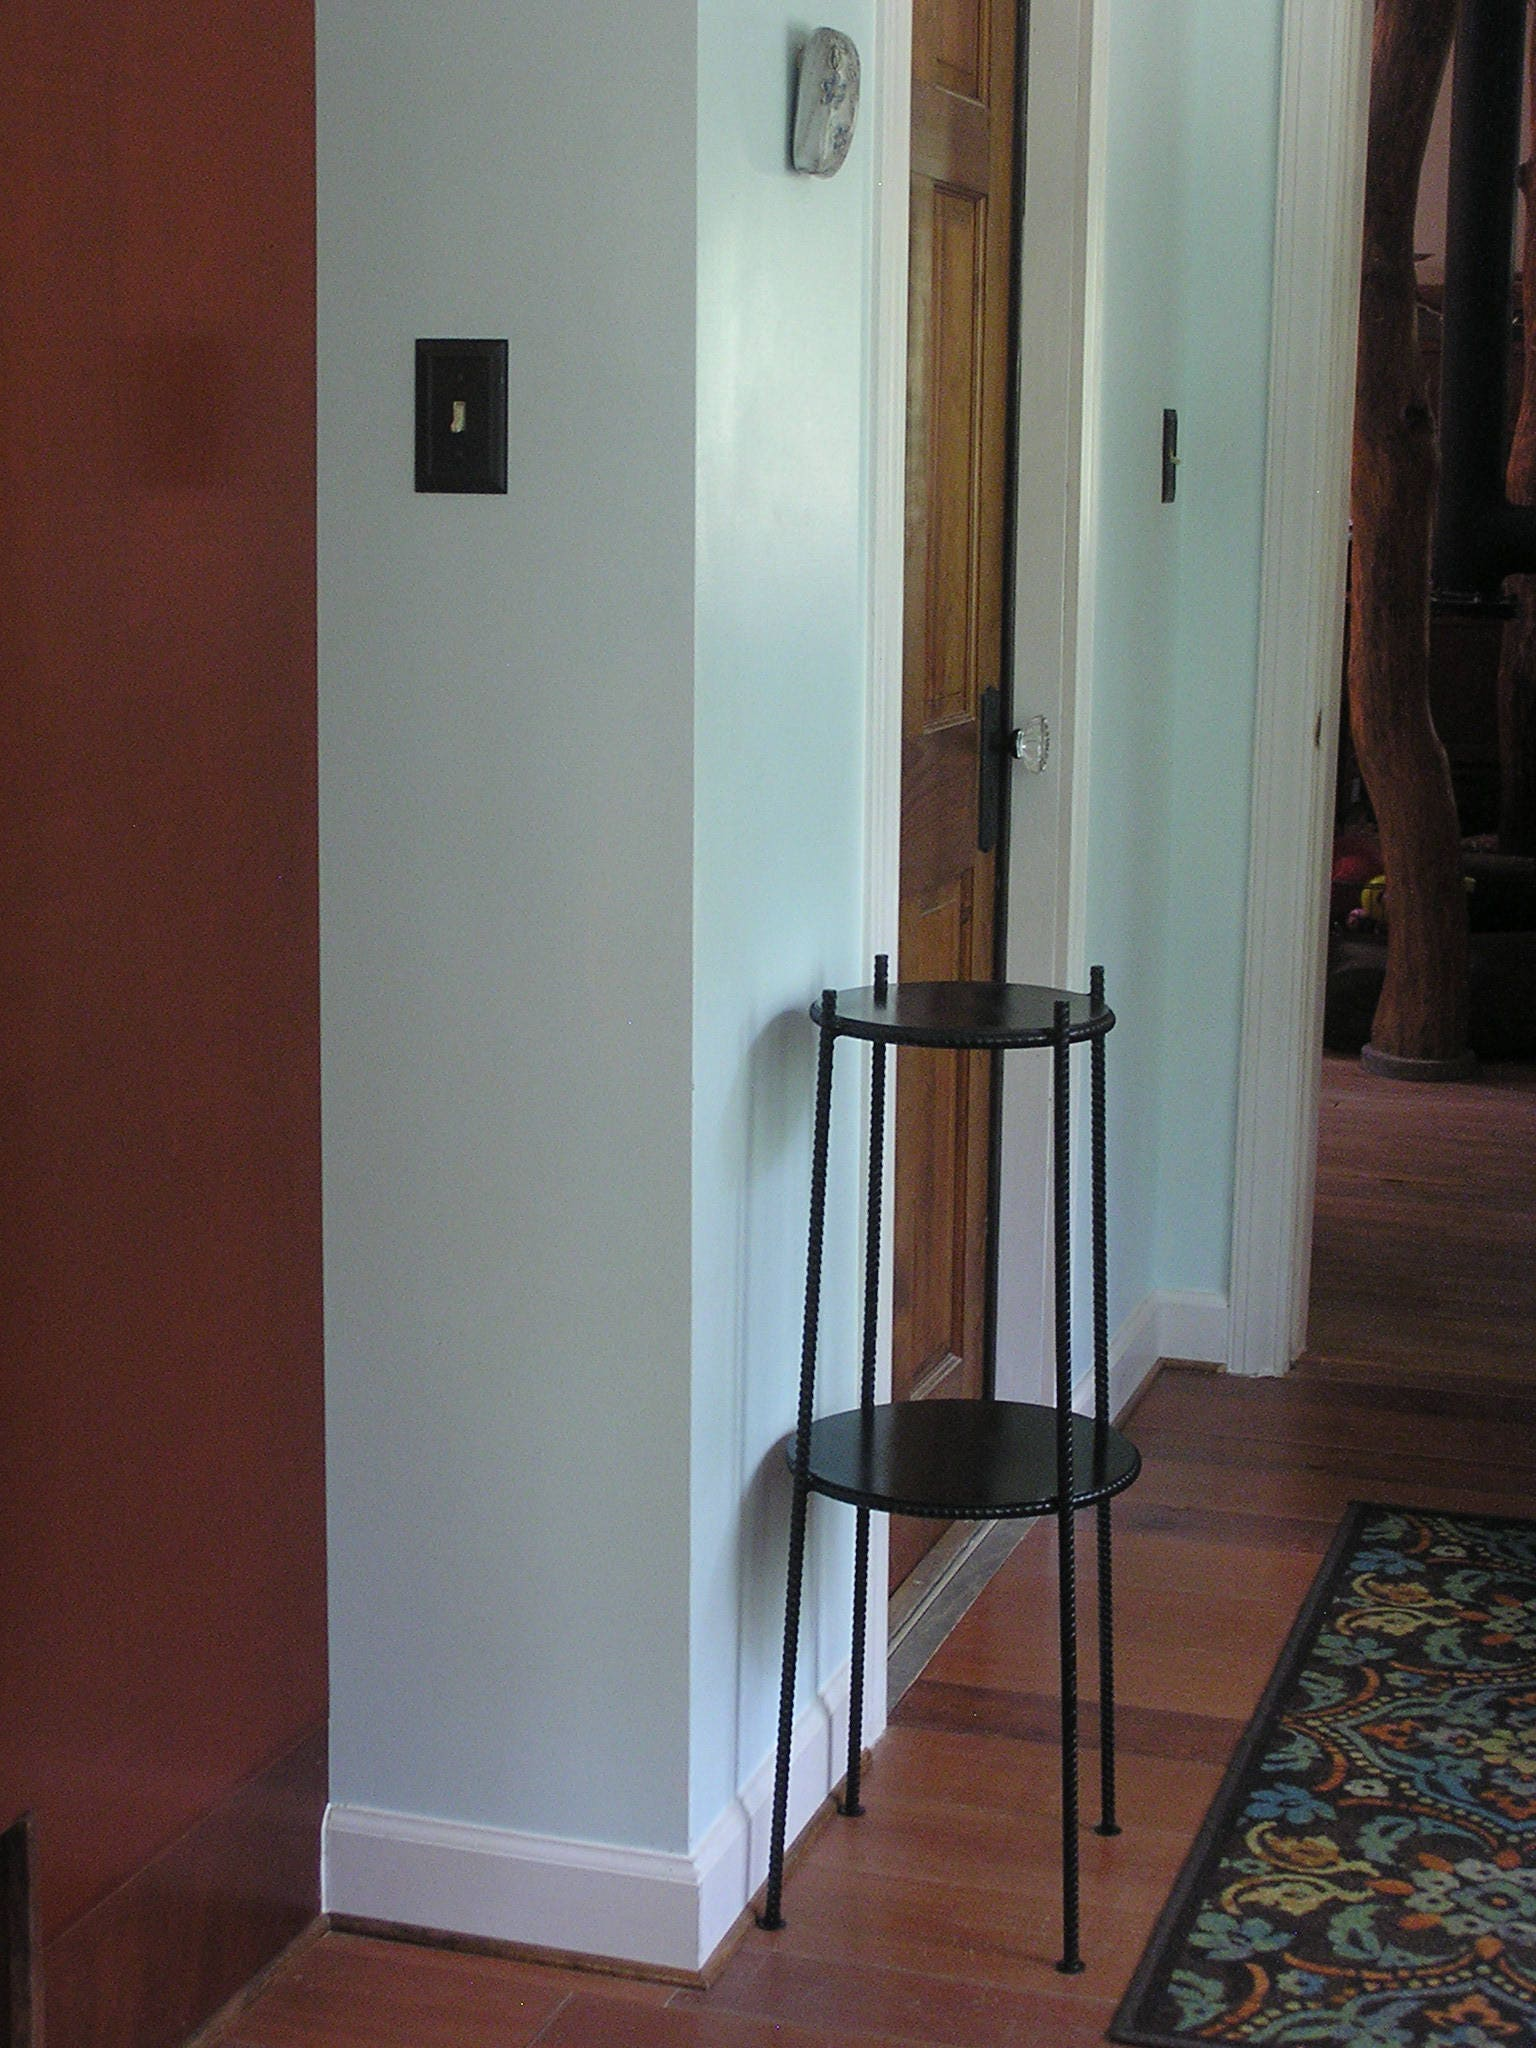 Berkey Water Filter Floor Stand | Etsy